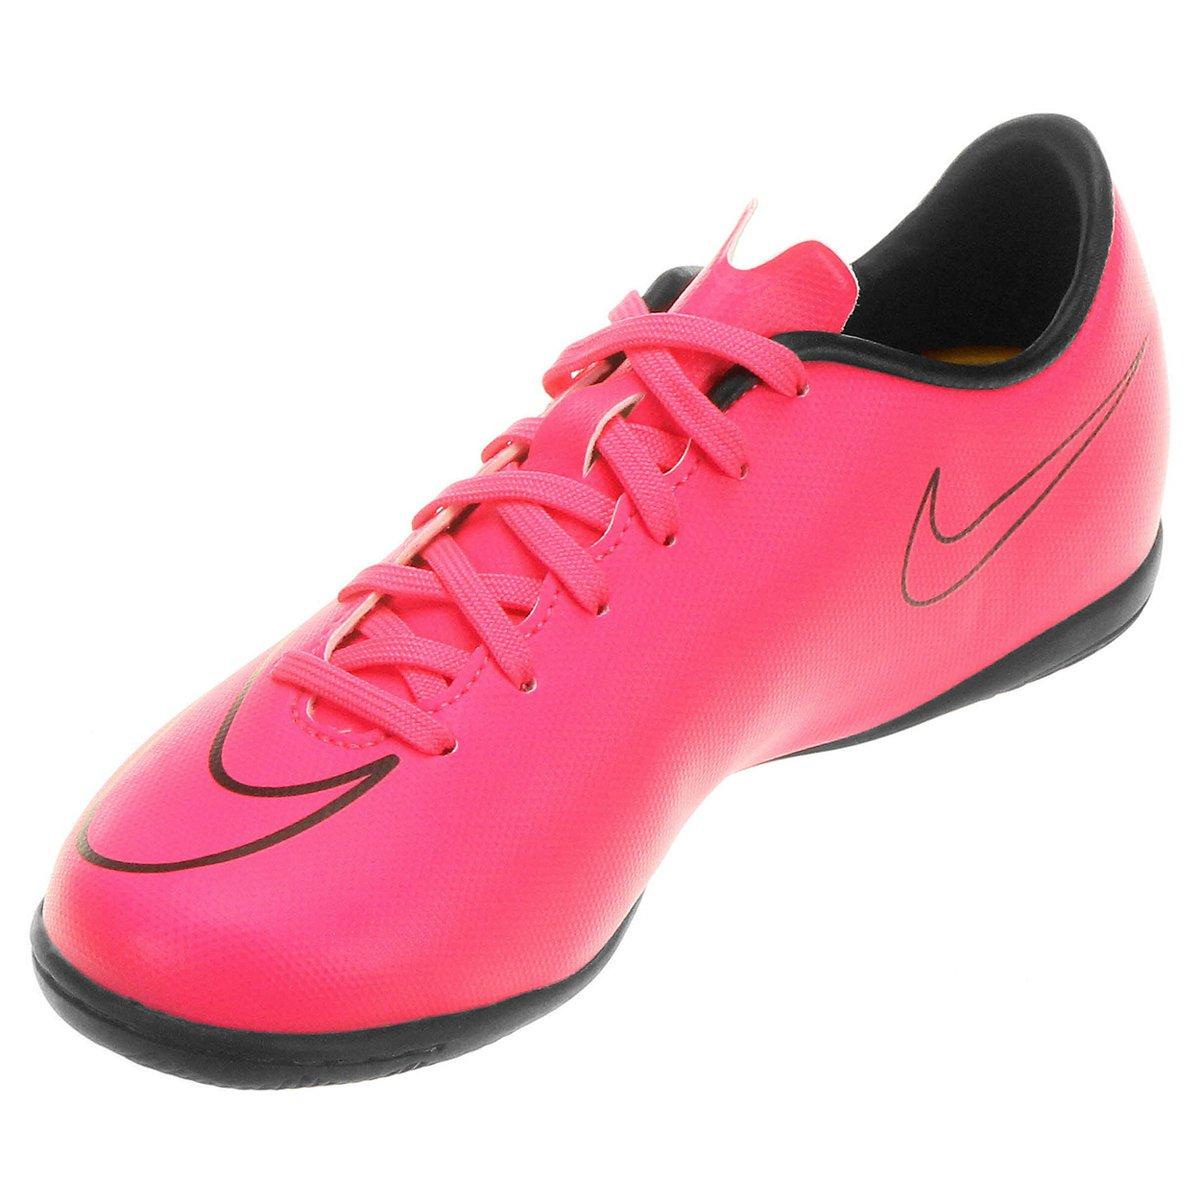 2fa92e331c Chuteira Nike Mercurial Victory 5 Ic Futsal - Musée des ...